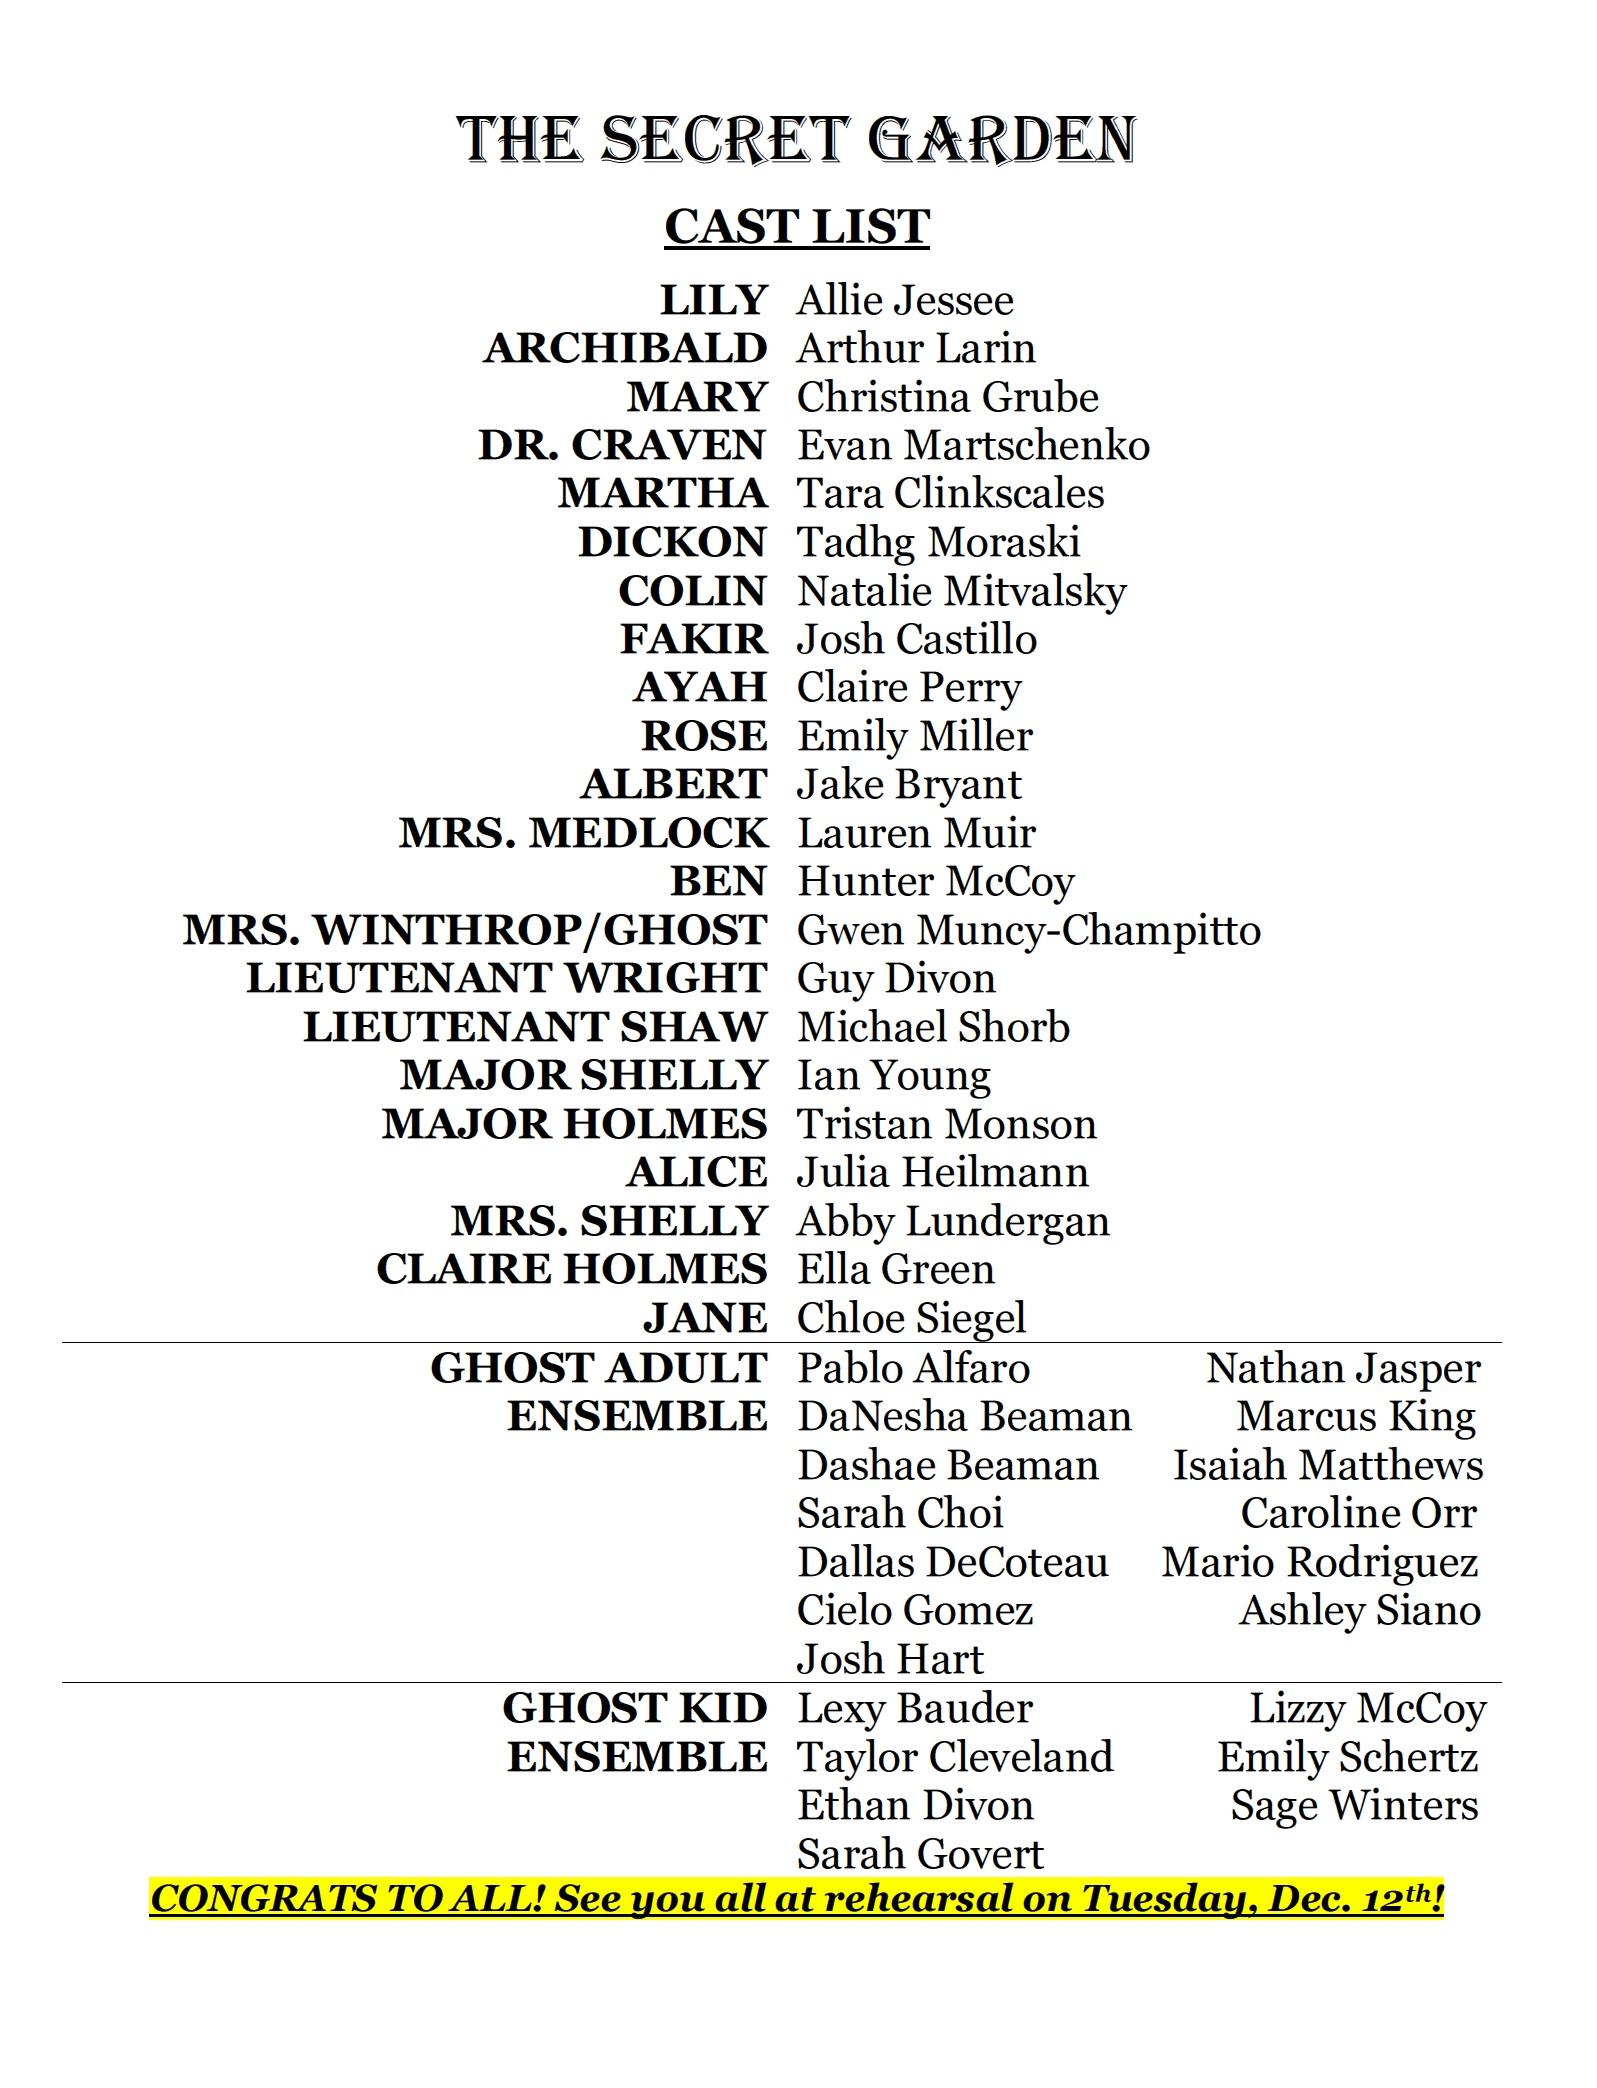 Some countries The voyeur cast list feels